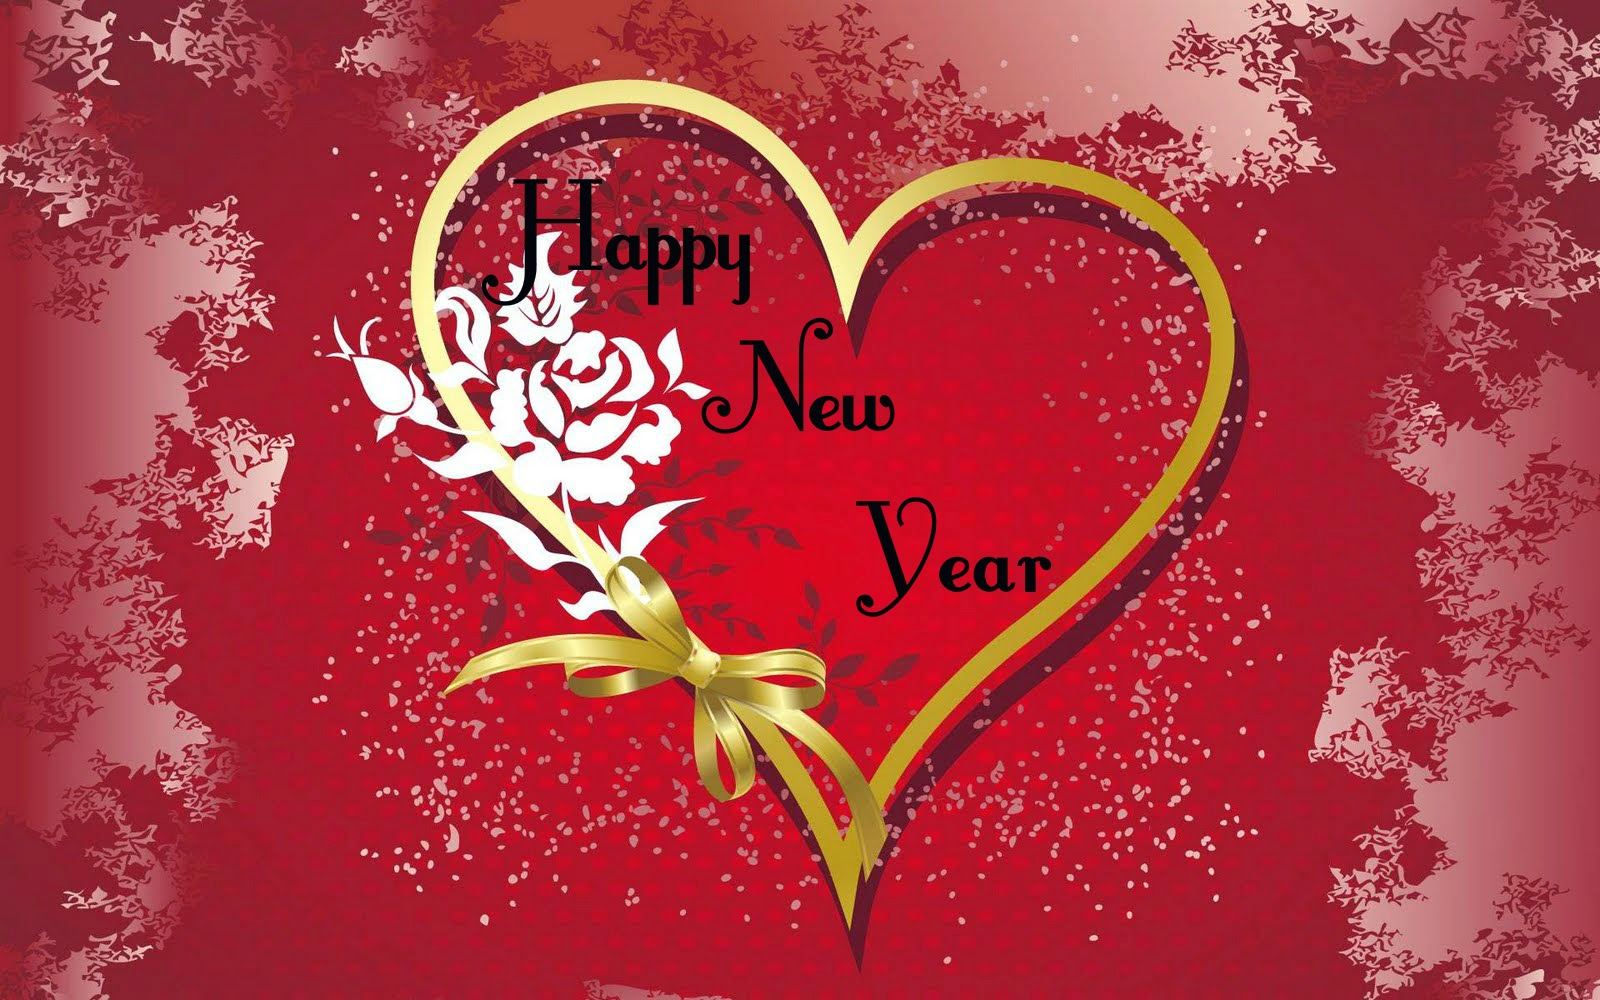 Happy New Year Janu 53